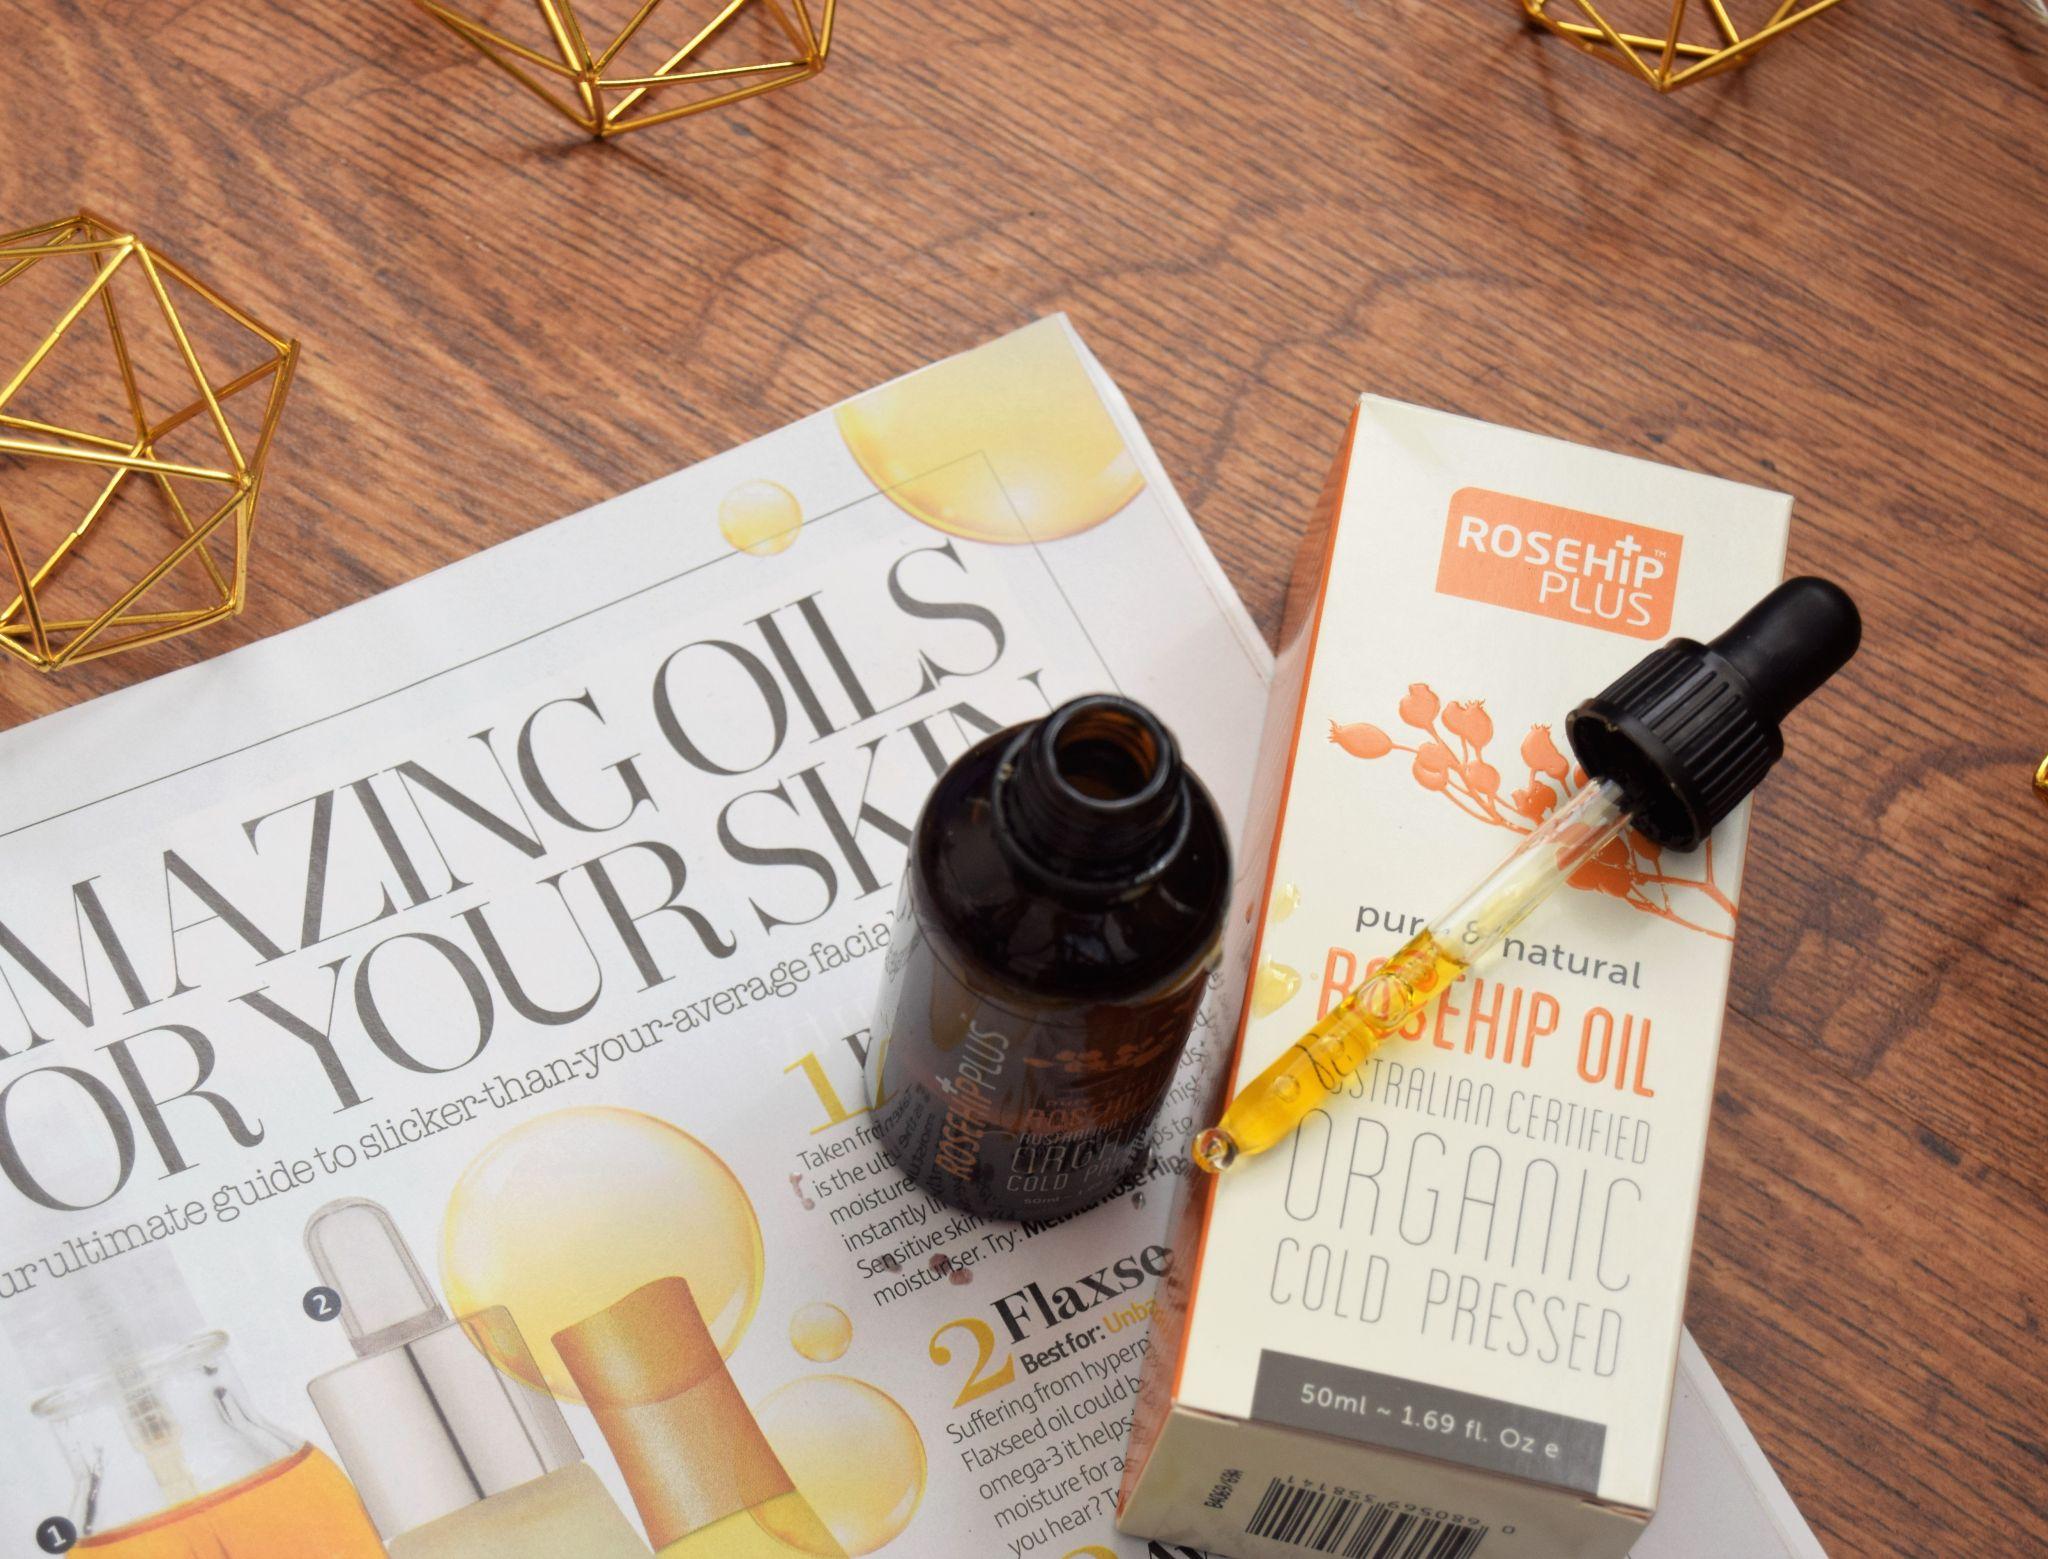 DSC 3220 1440x1096 - The Amazing Secrets of Rosehip Oil